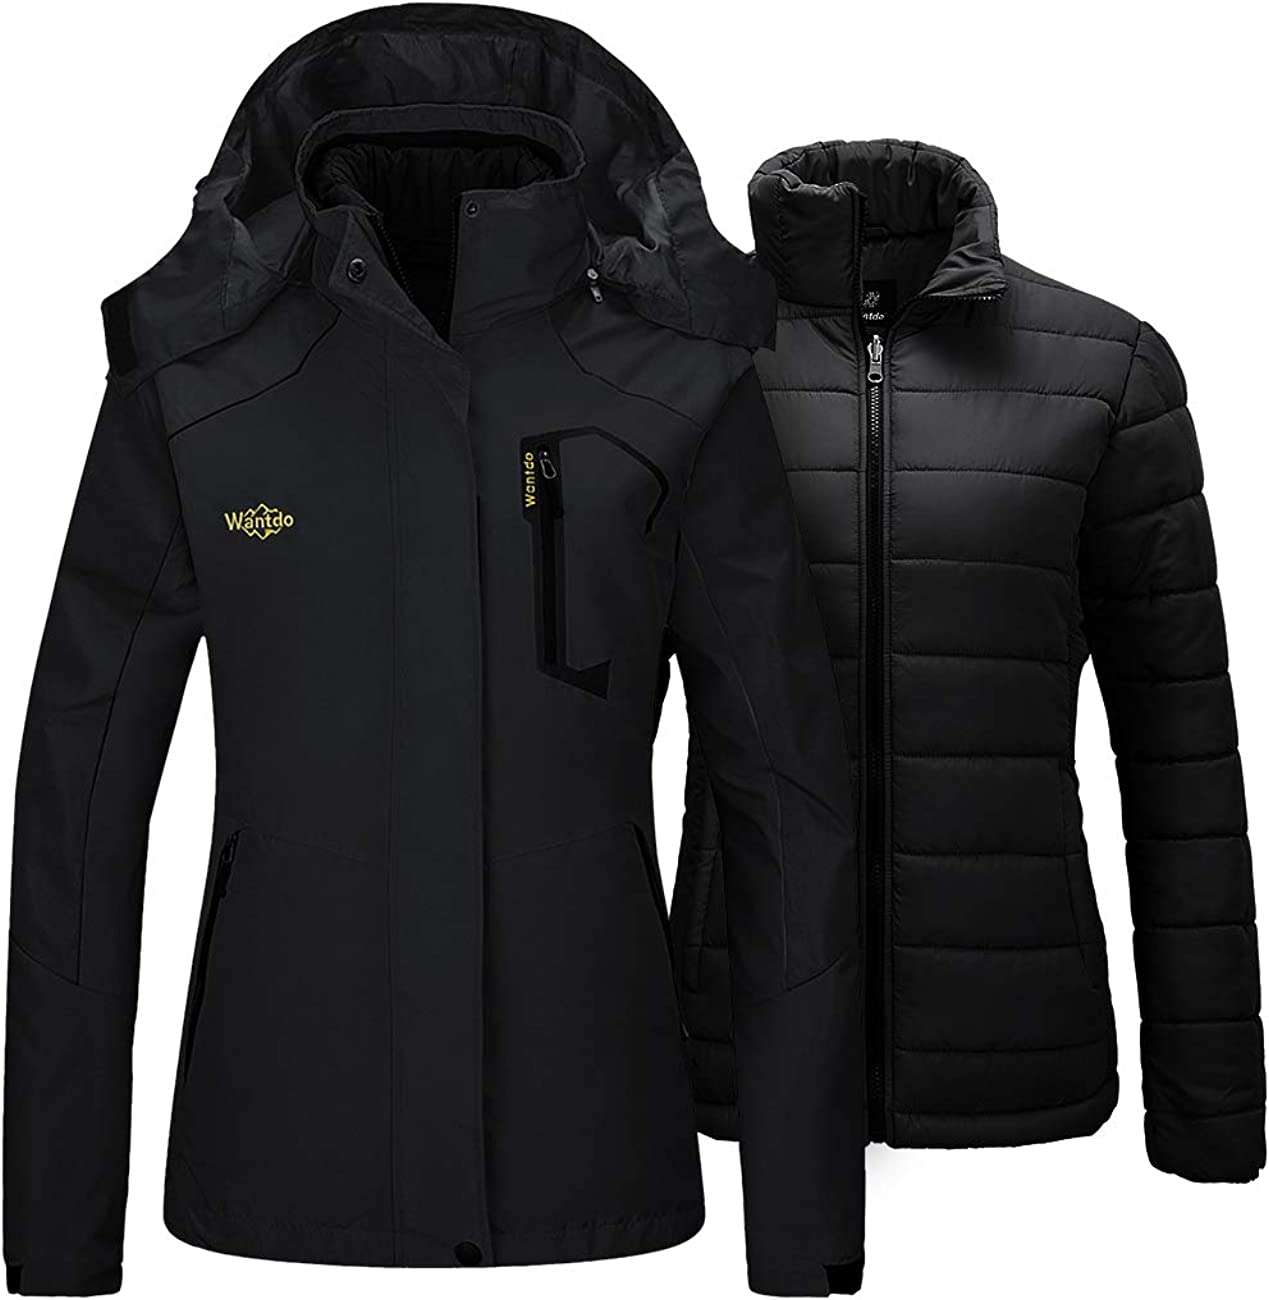 Wantdo Women's 3 in 1 Ski Jacket Waterproof Raincoat with Removable Puffer Inner